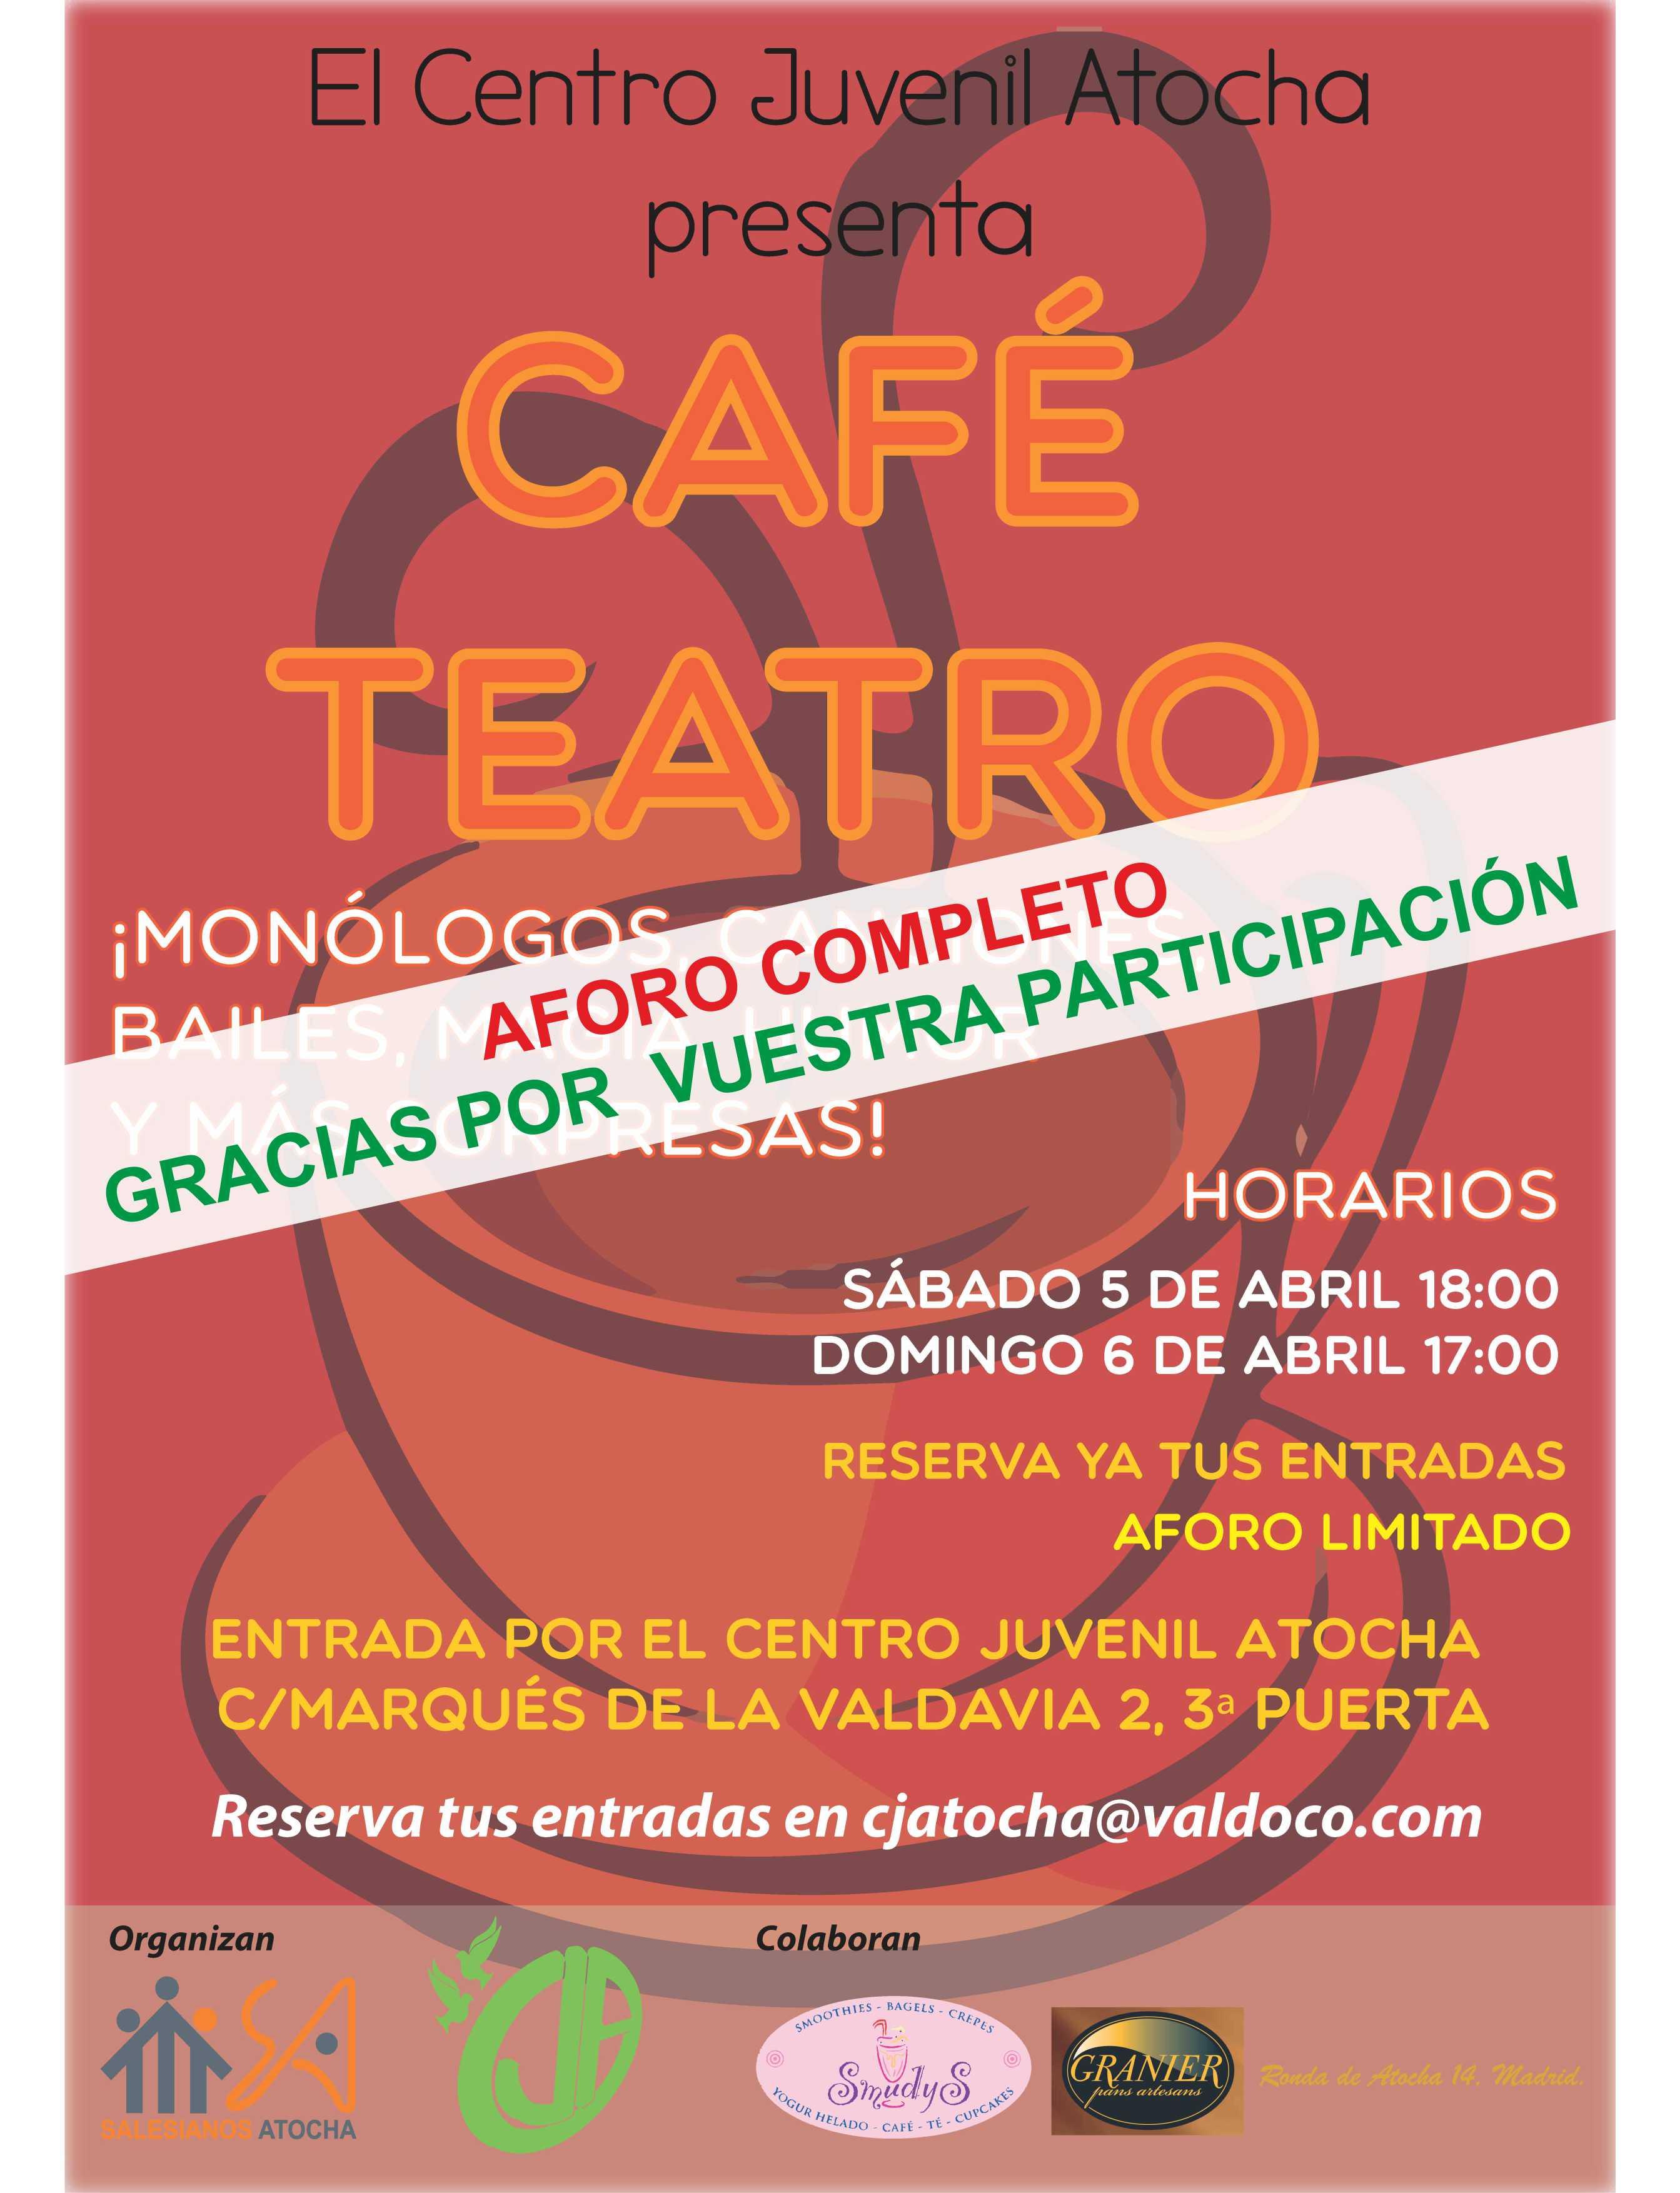 Café-Teatro- AFORO COMPLETO